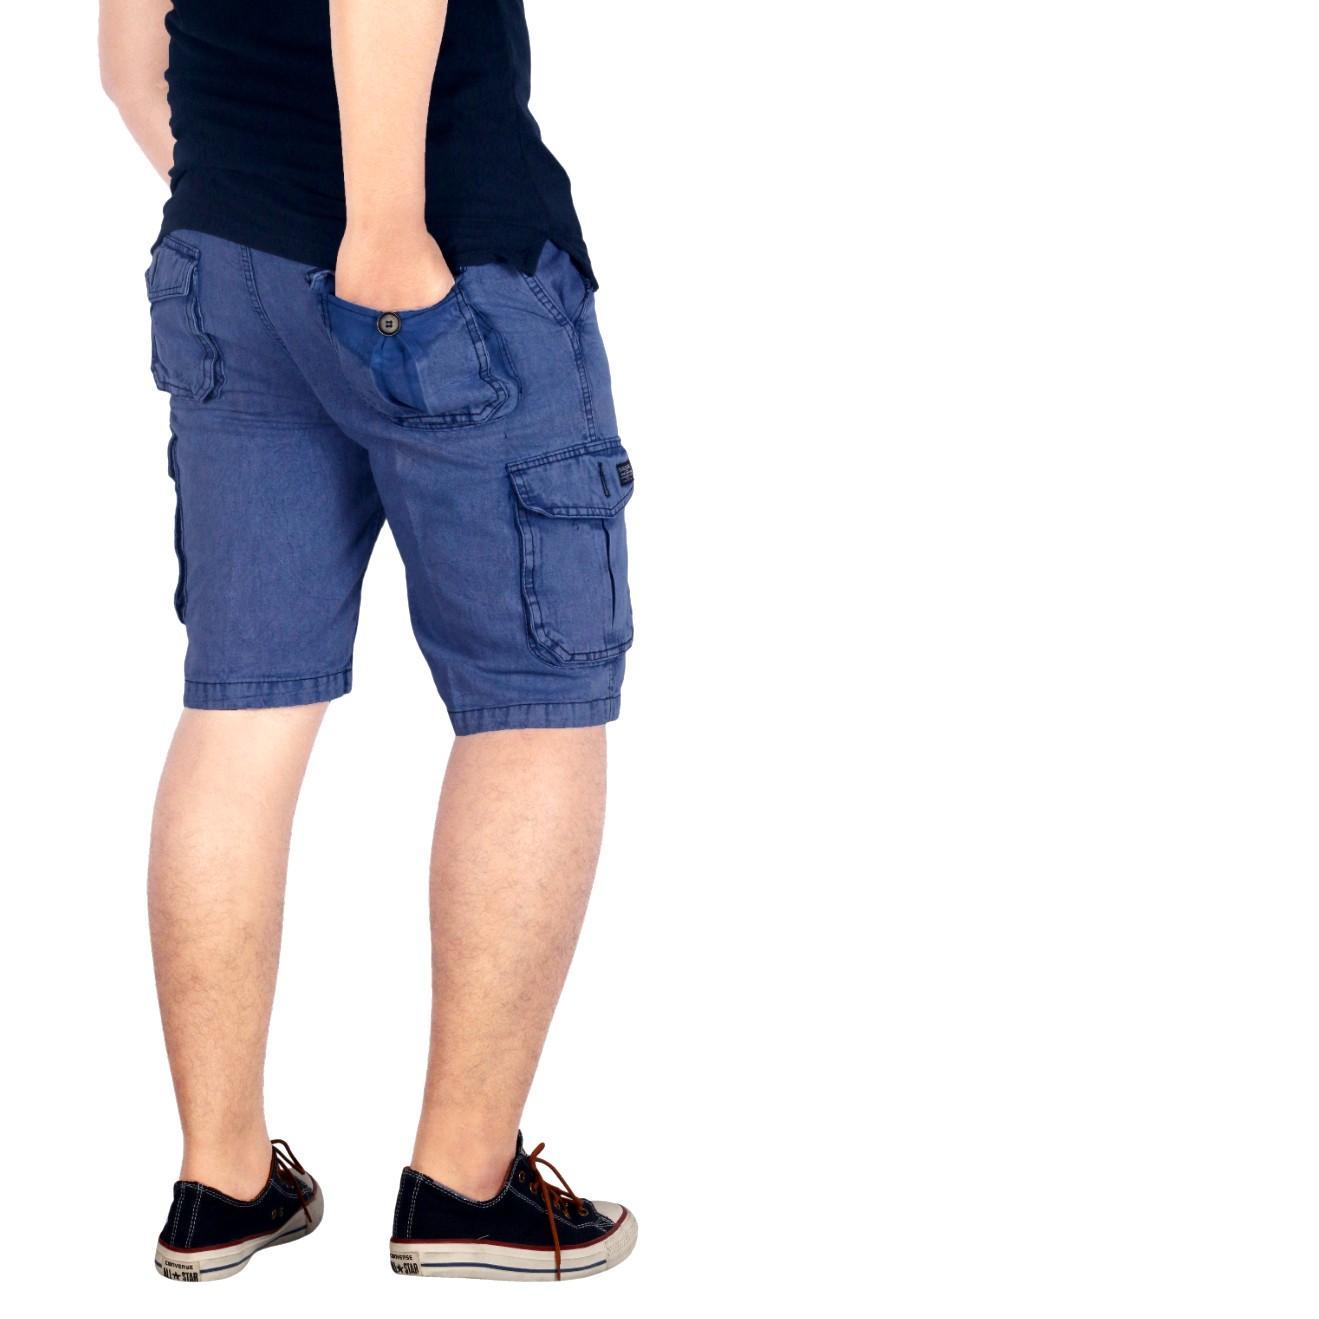 BSG_Fashion1 Celana Pendek Polos Navy Distro/ Celana Skinny/Celana Pants/ Celana Santai/